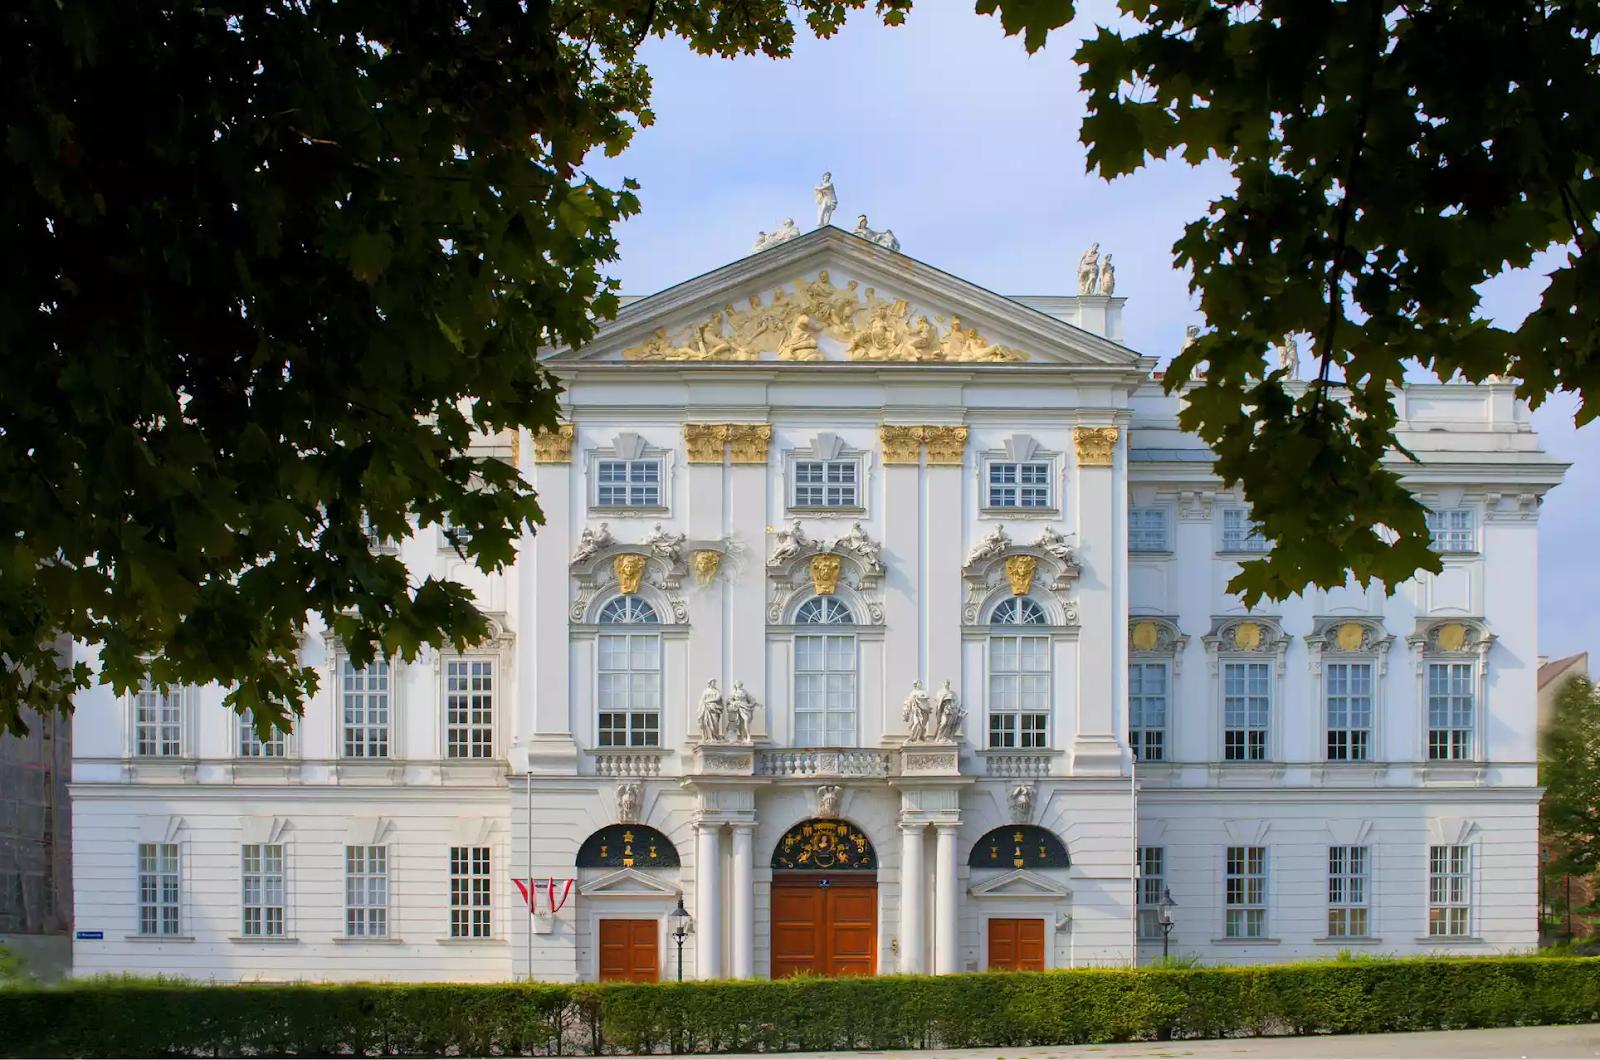 Mengenal Sejarah Gaya Arsitektur Barok Di Seluruh Dunia